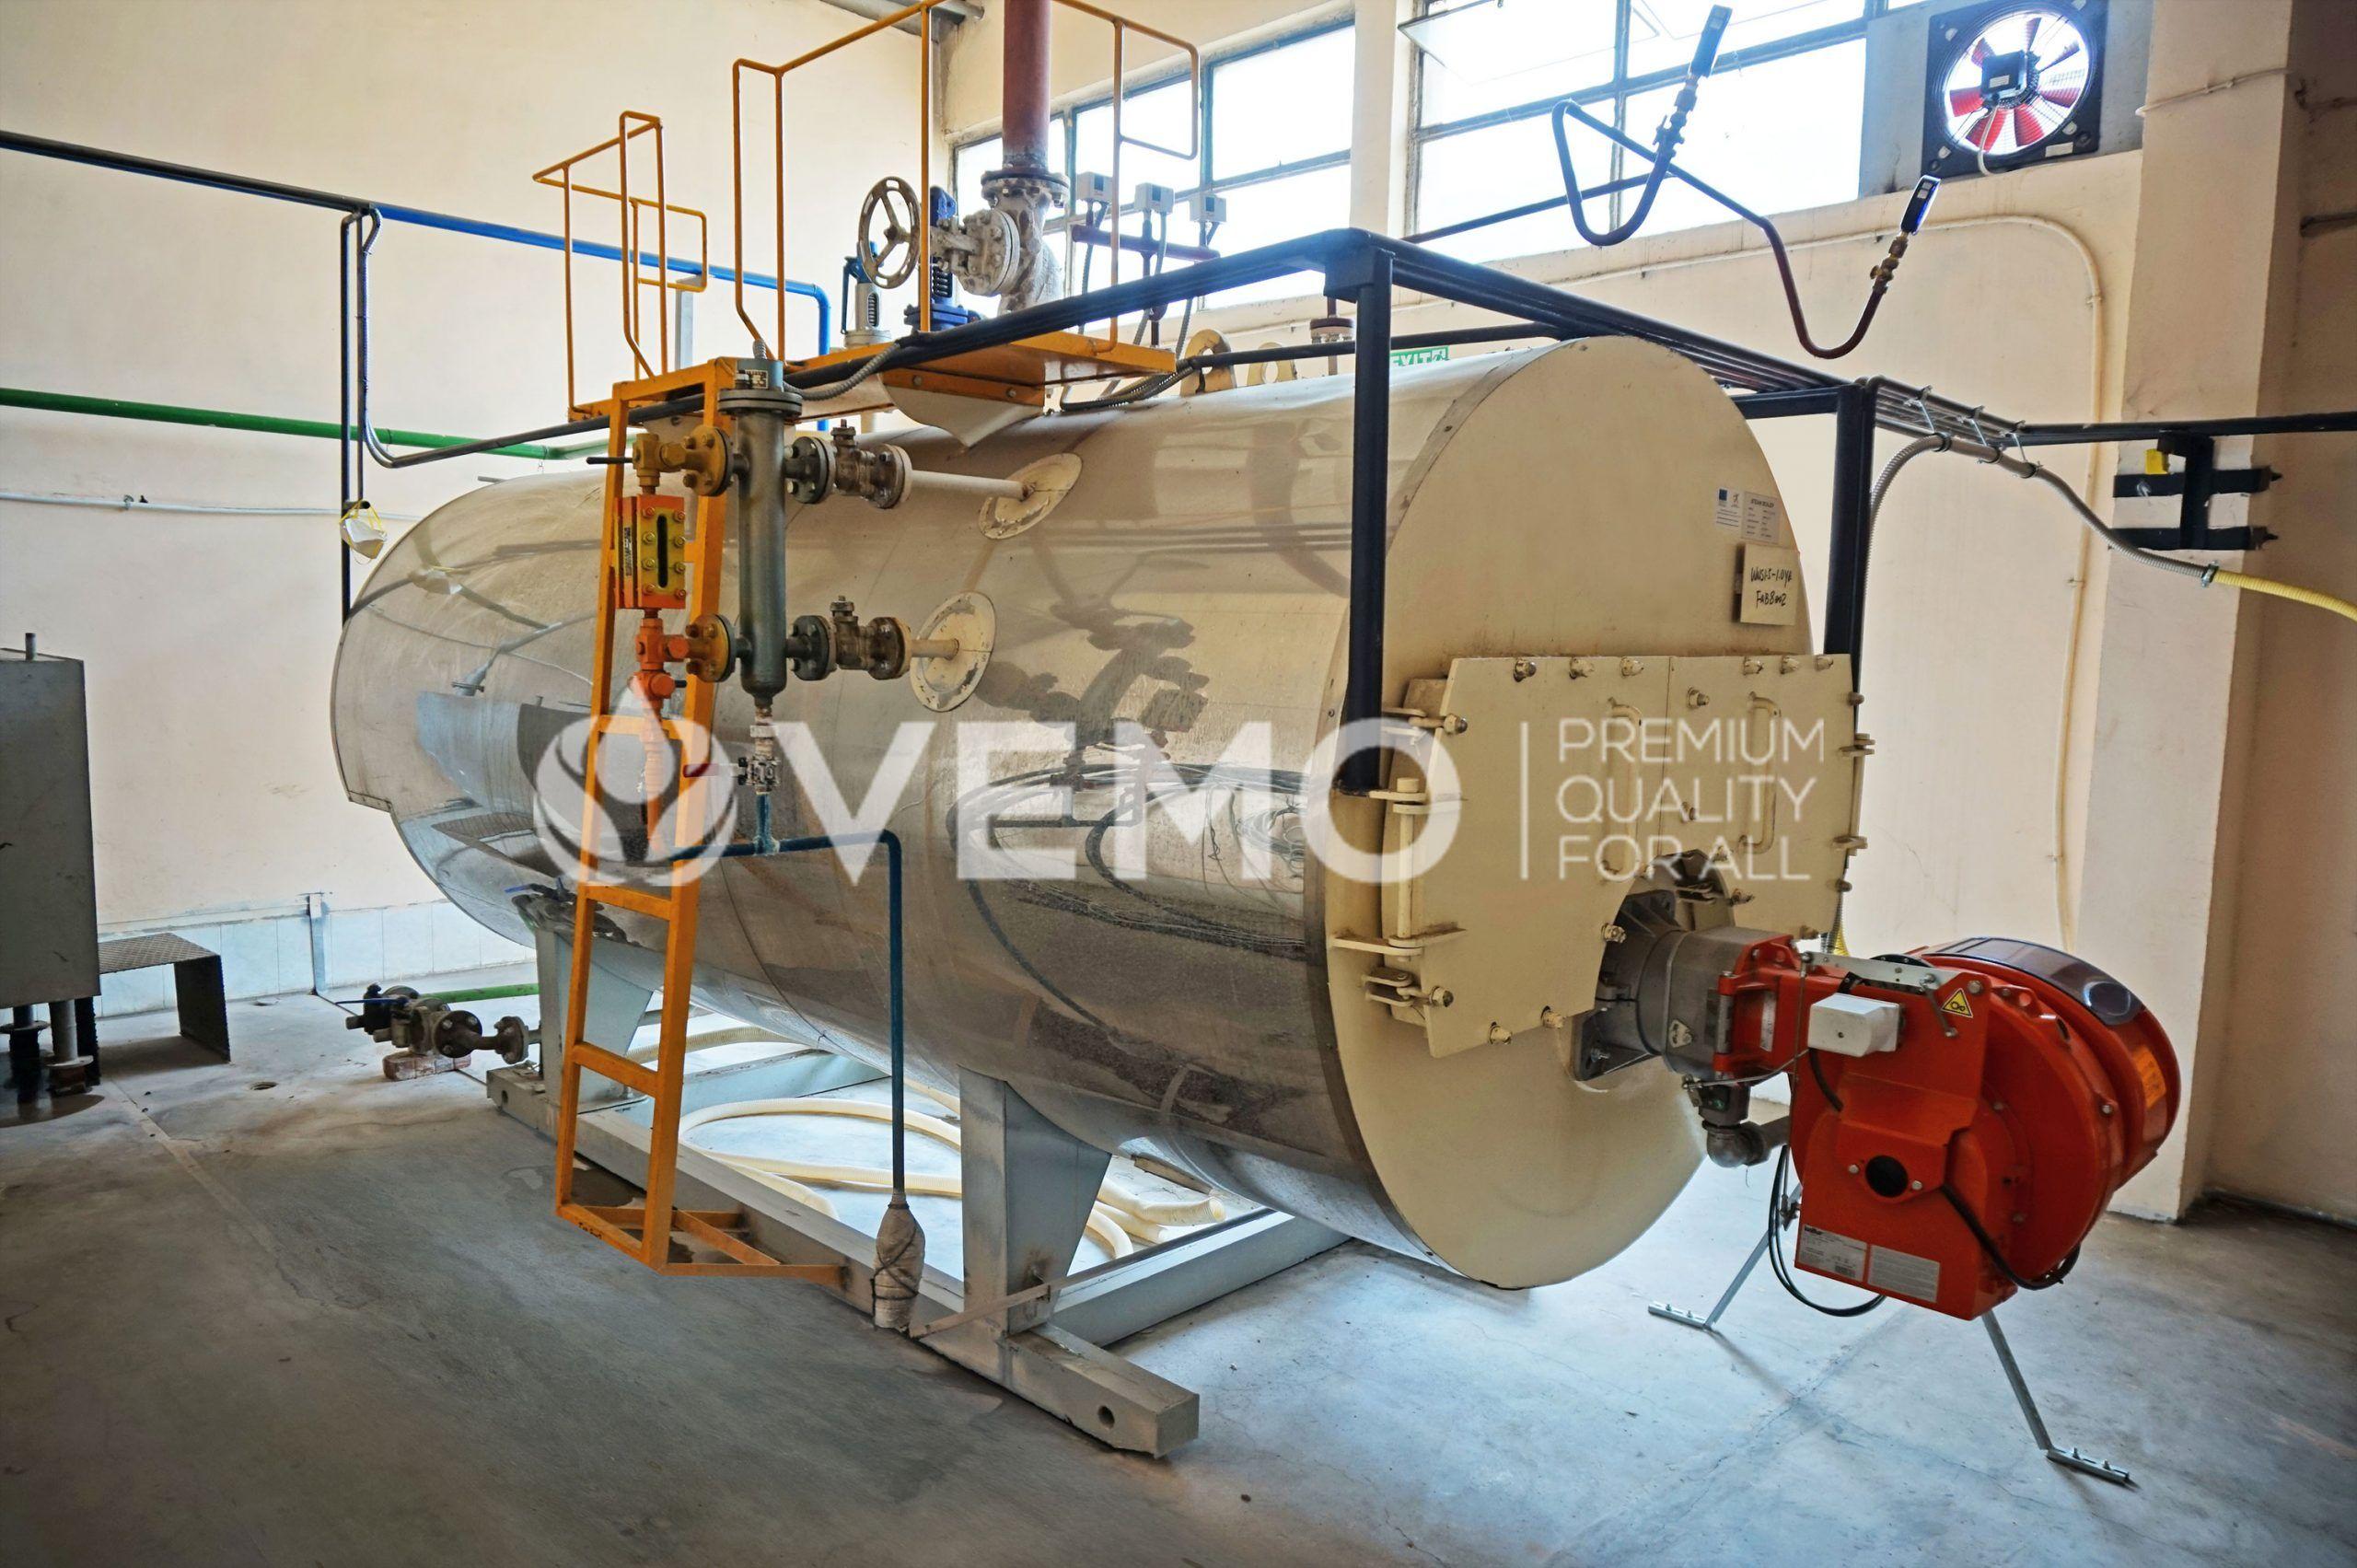 vemo_vemoherb_manufacturing